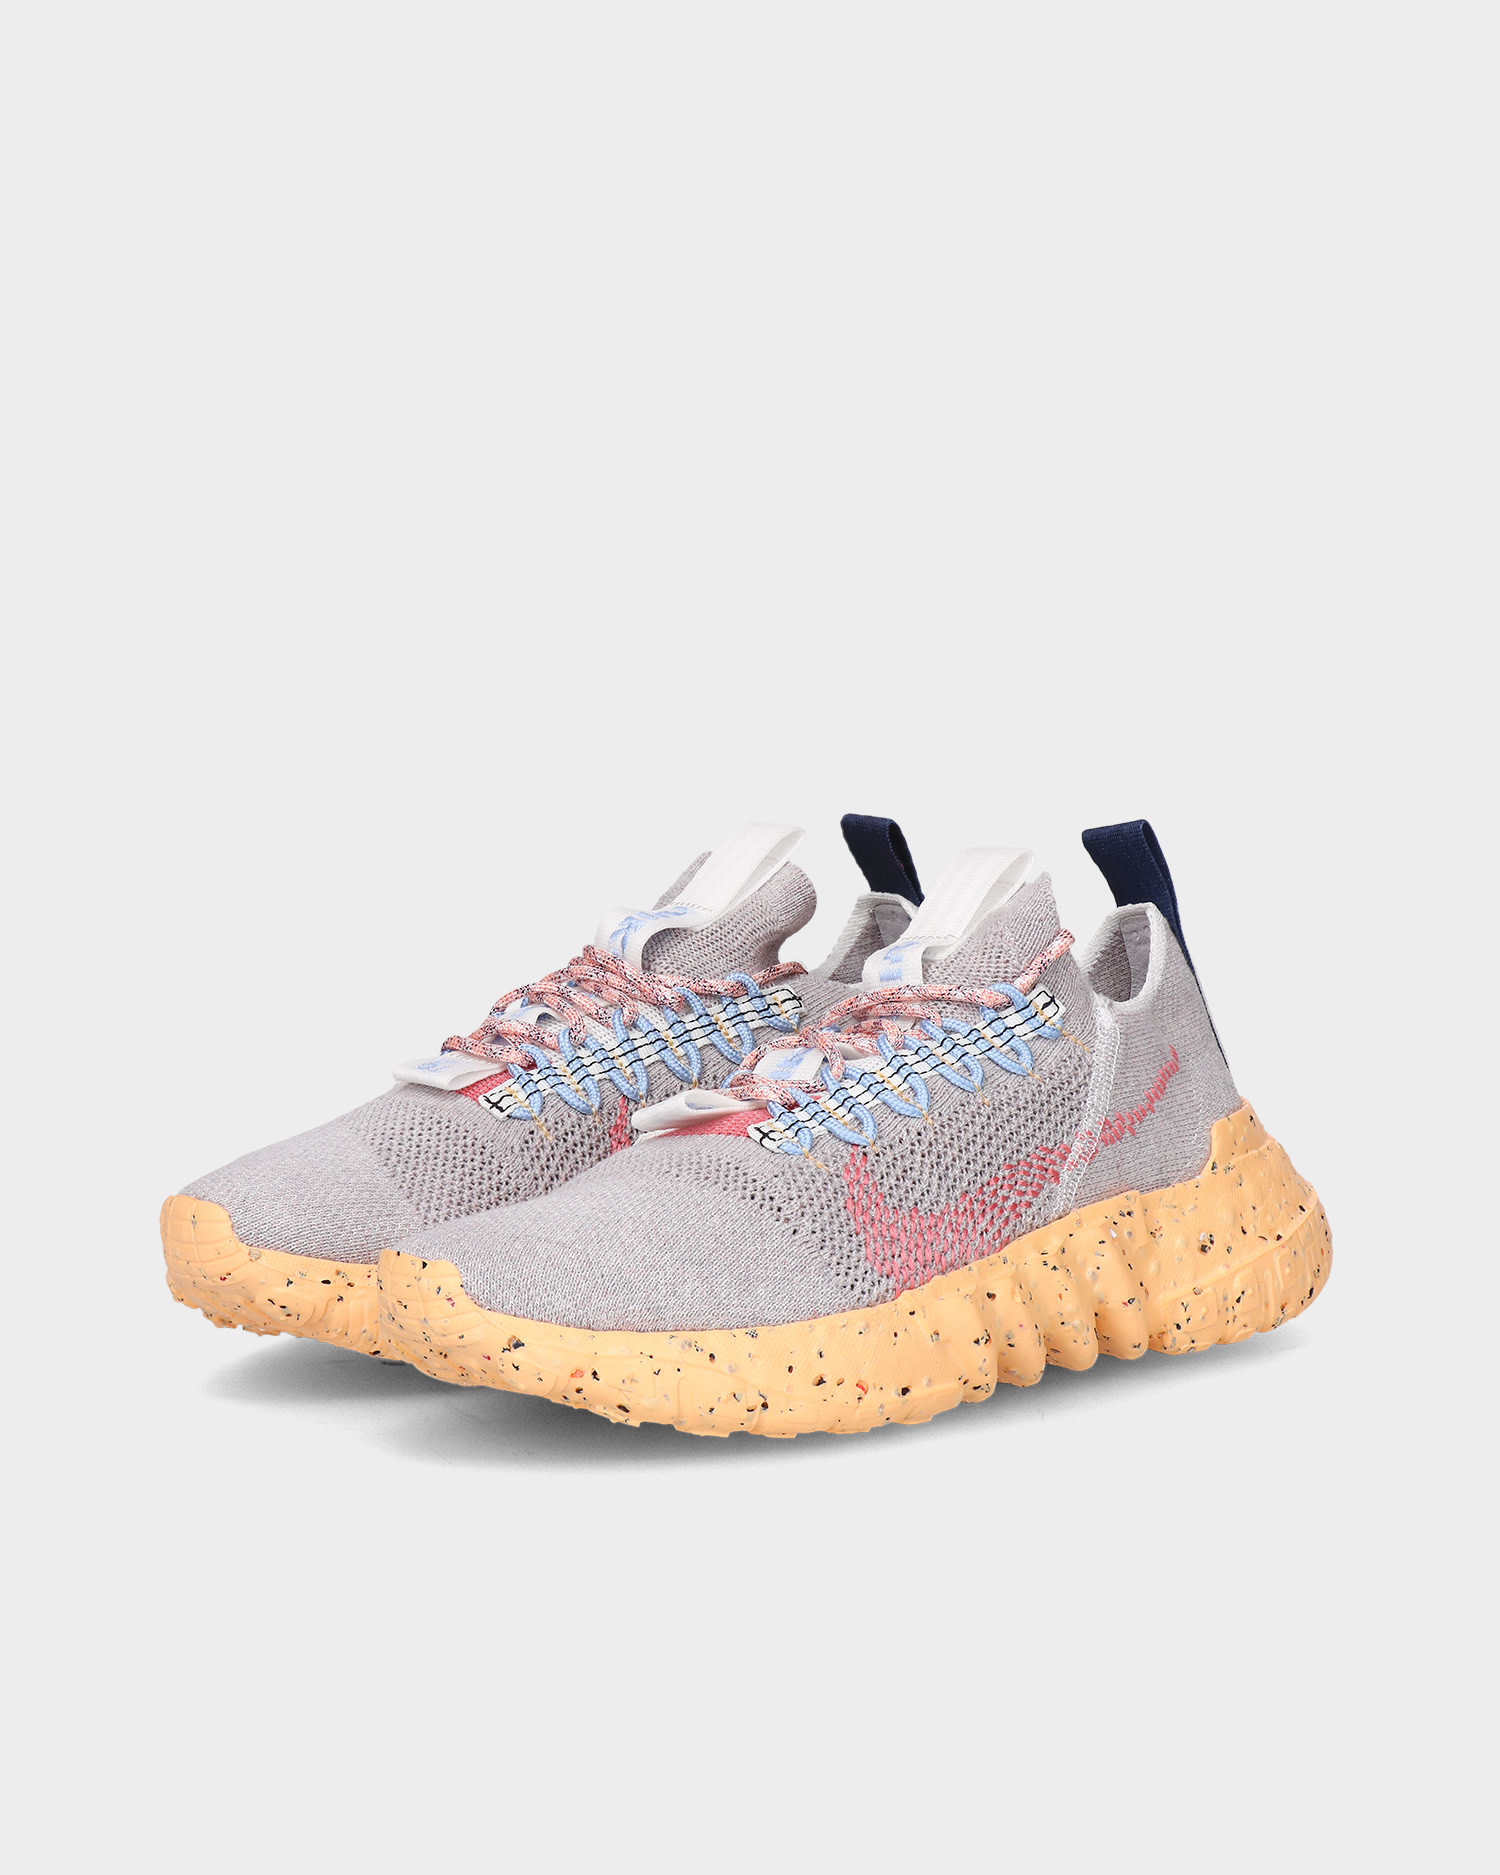 Nike space hippie 01 Vast grey/summit white-melon tint